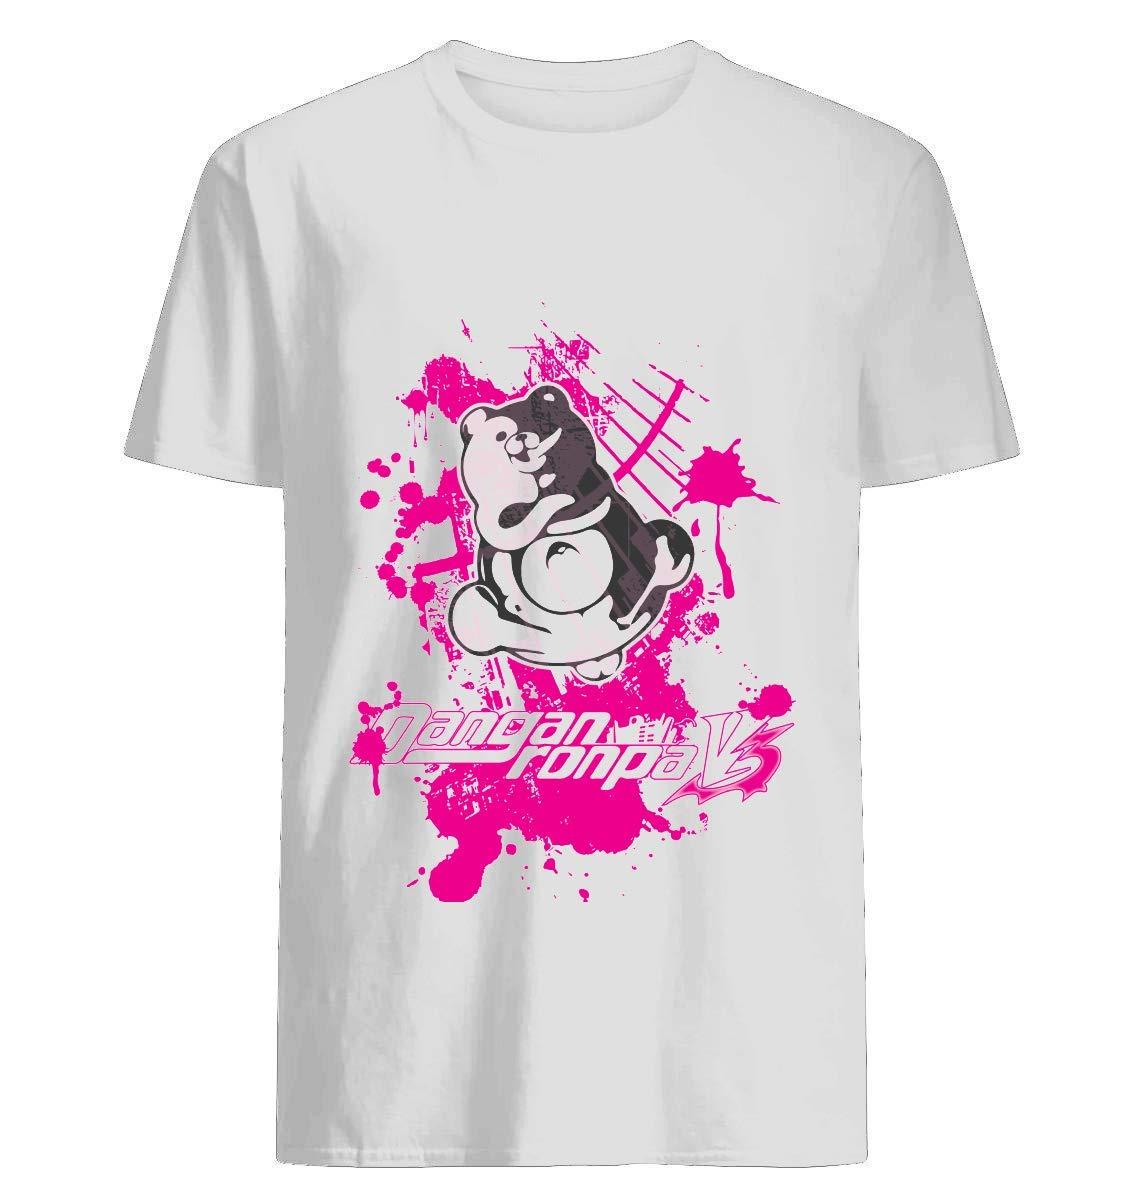 Danganronpa V3 Shirts